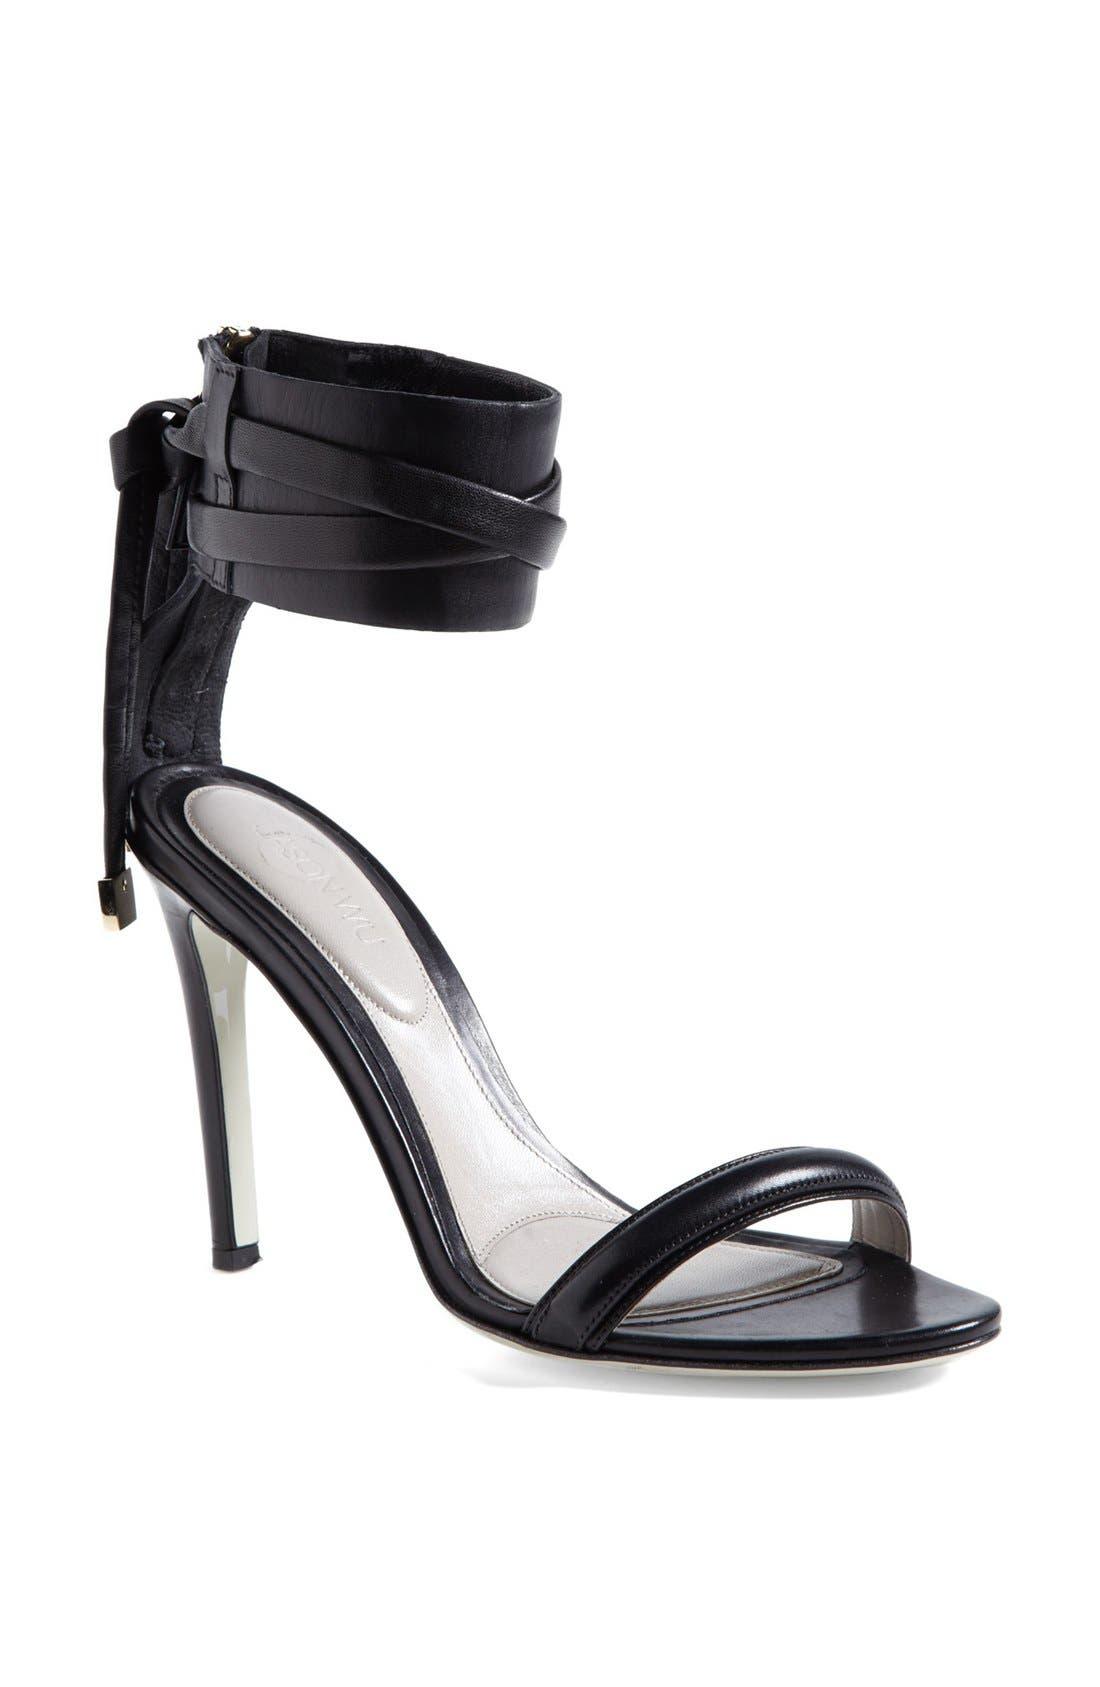 Alternate Image 1 Selected - Jason Wu Ankle Strap Sandal